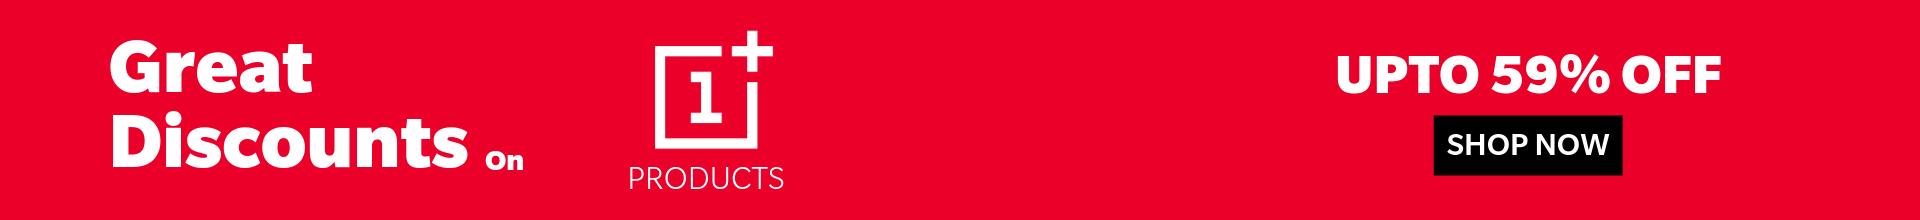 OnePlus Discount Web Banner 1920×220